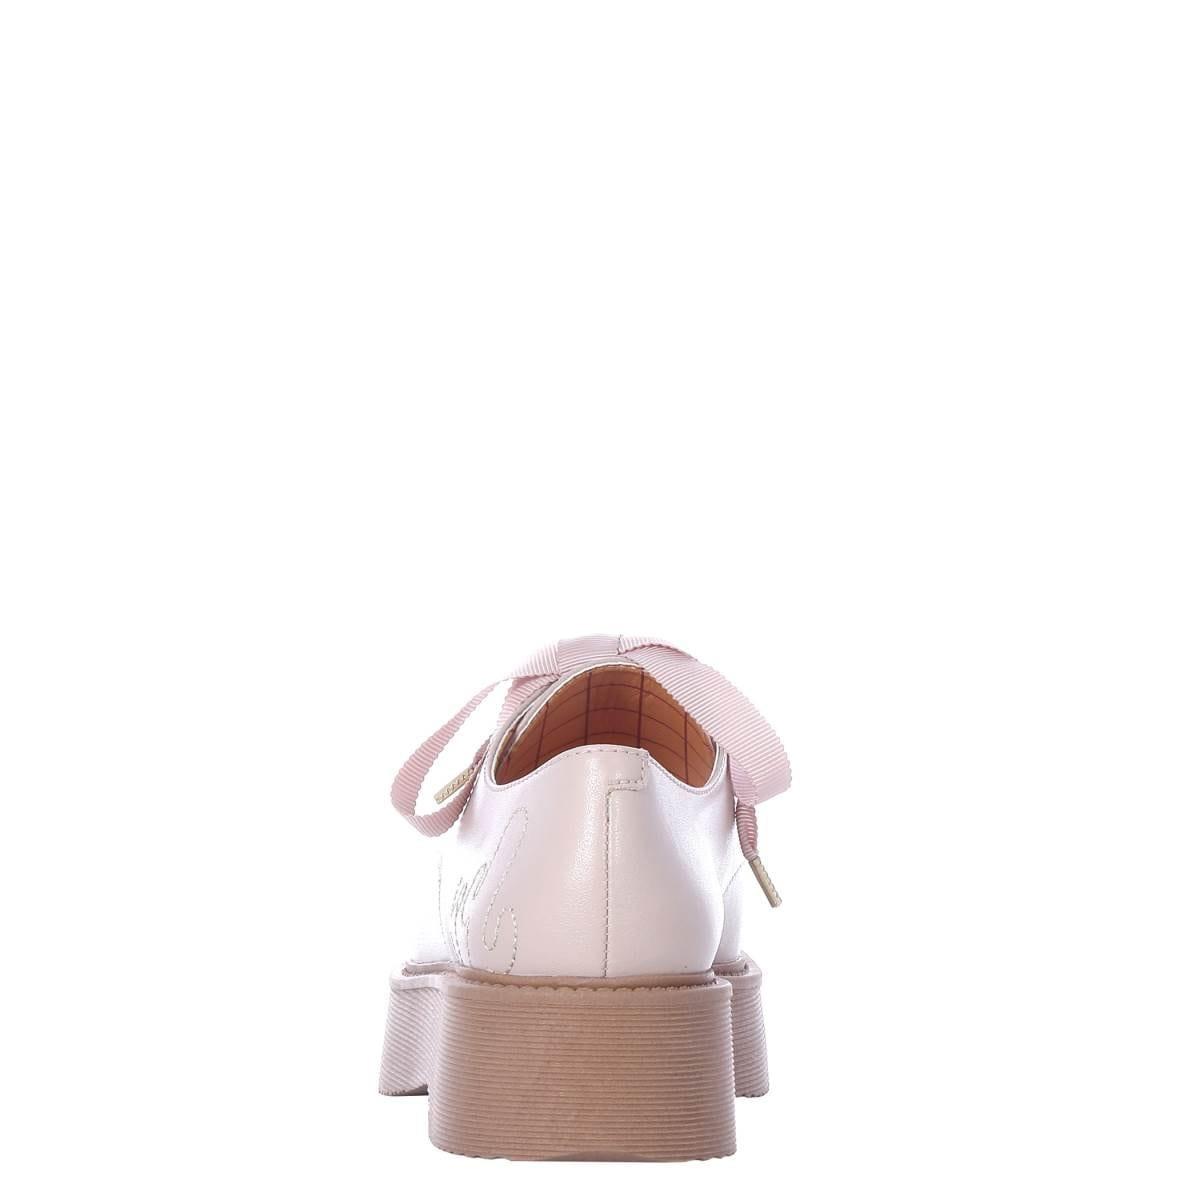 Menstyle Rosa con Listón Toy Story Disney W Capsule